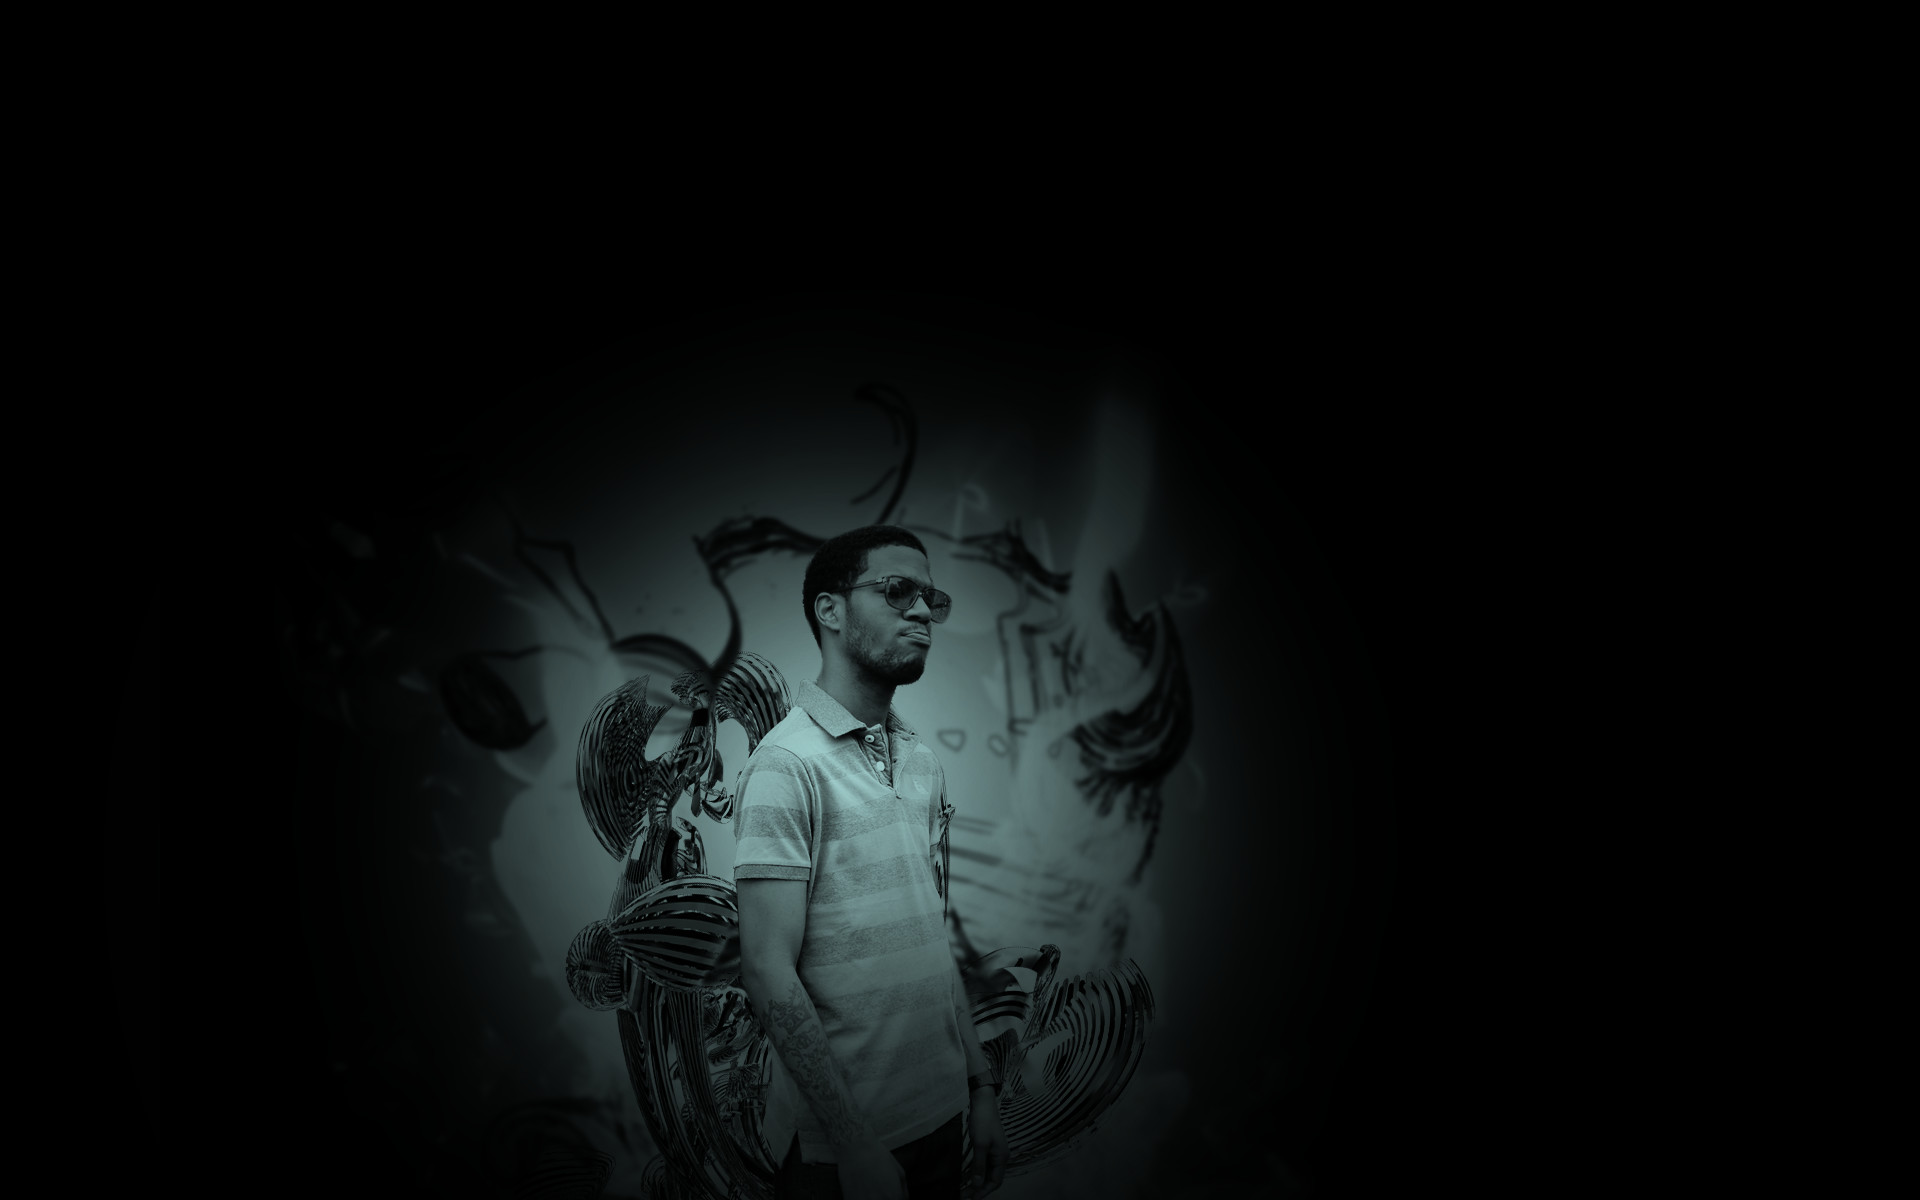 Swedish House Mafia Hd Wallpapers Kid Cudi Wallpaper 1080p 183 ①